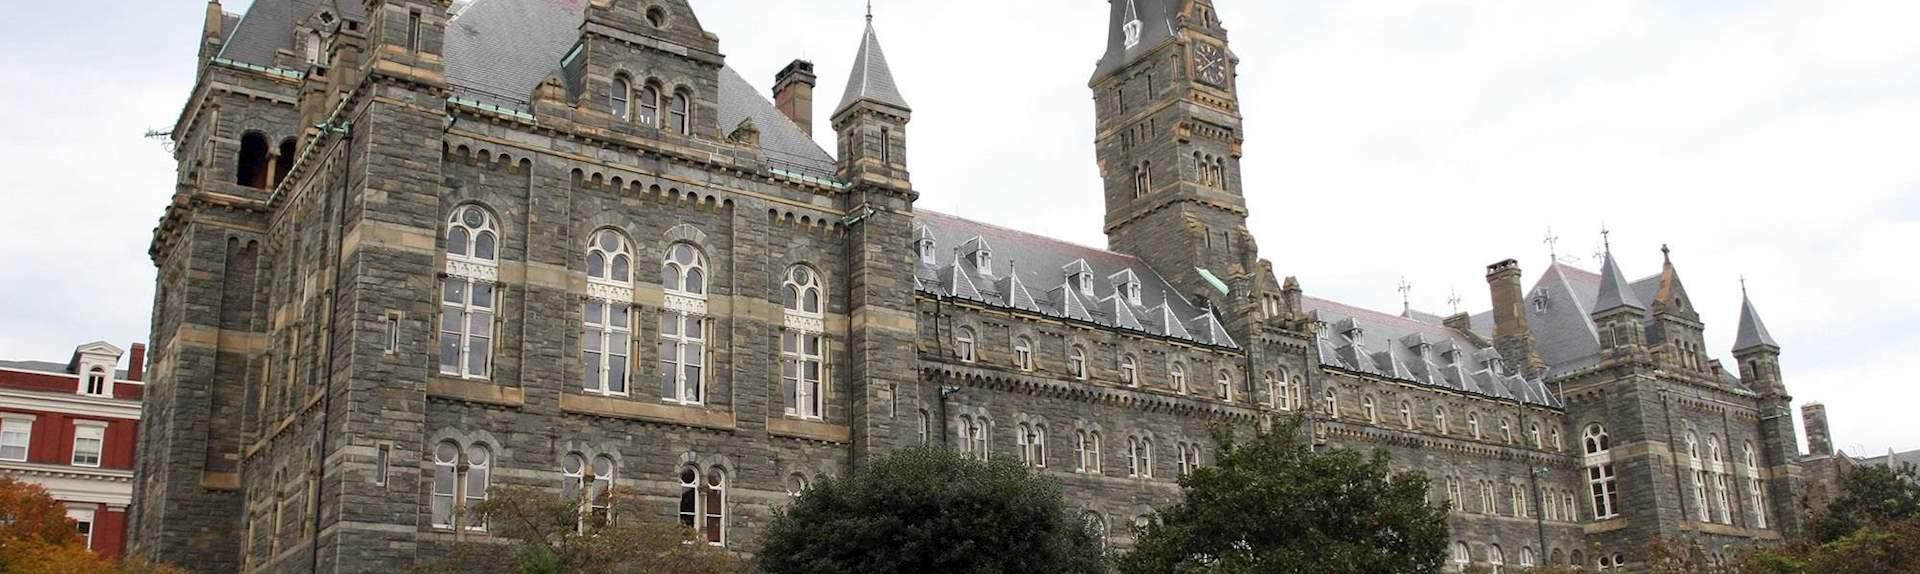 University in Washington, District of Columbia